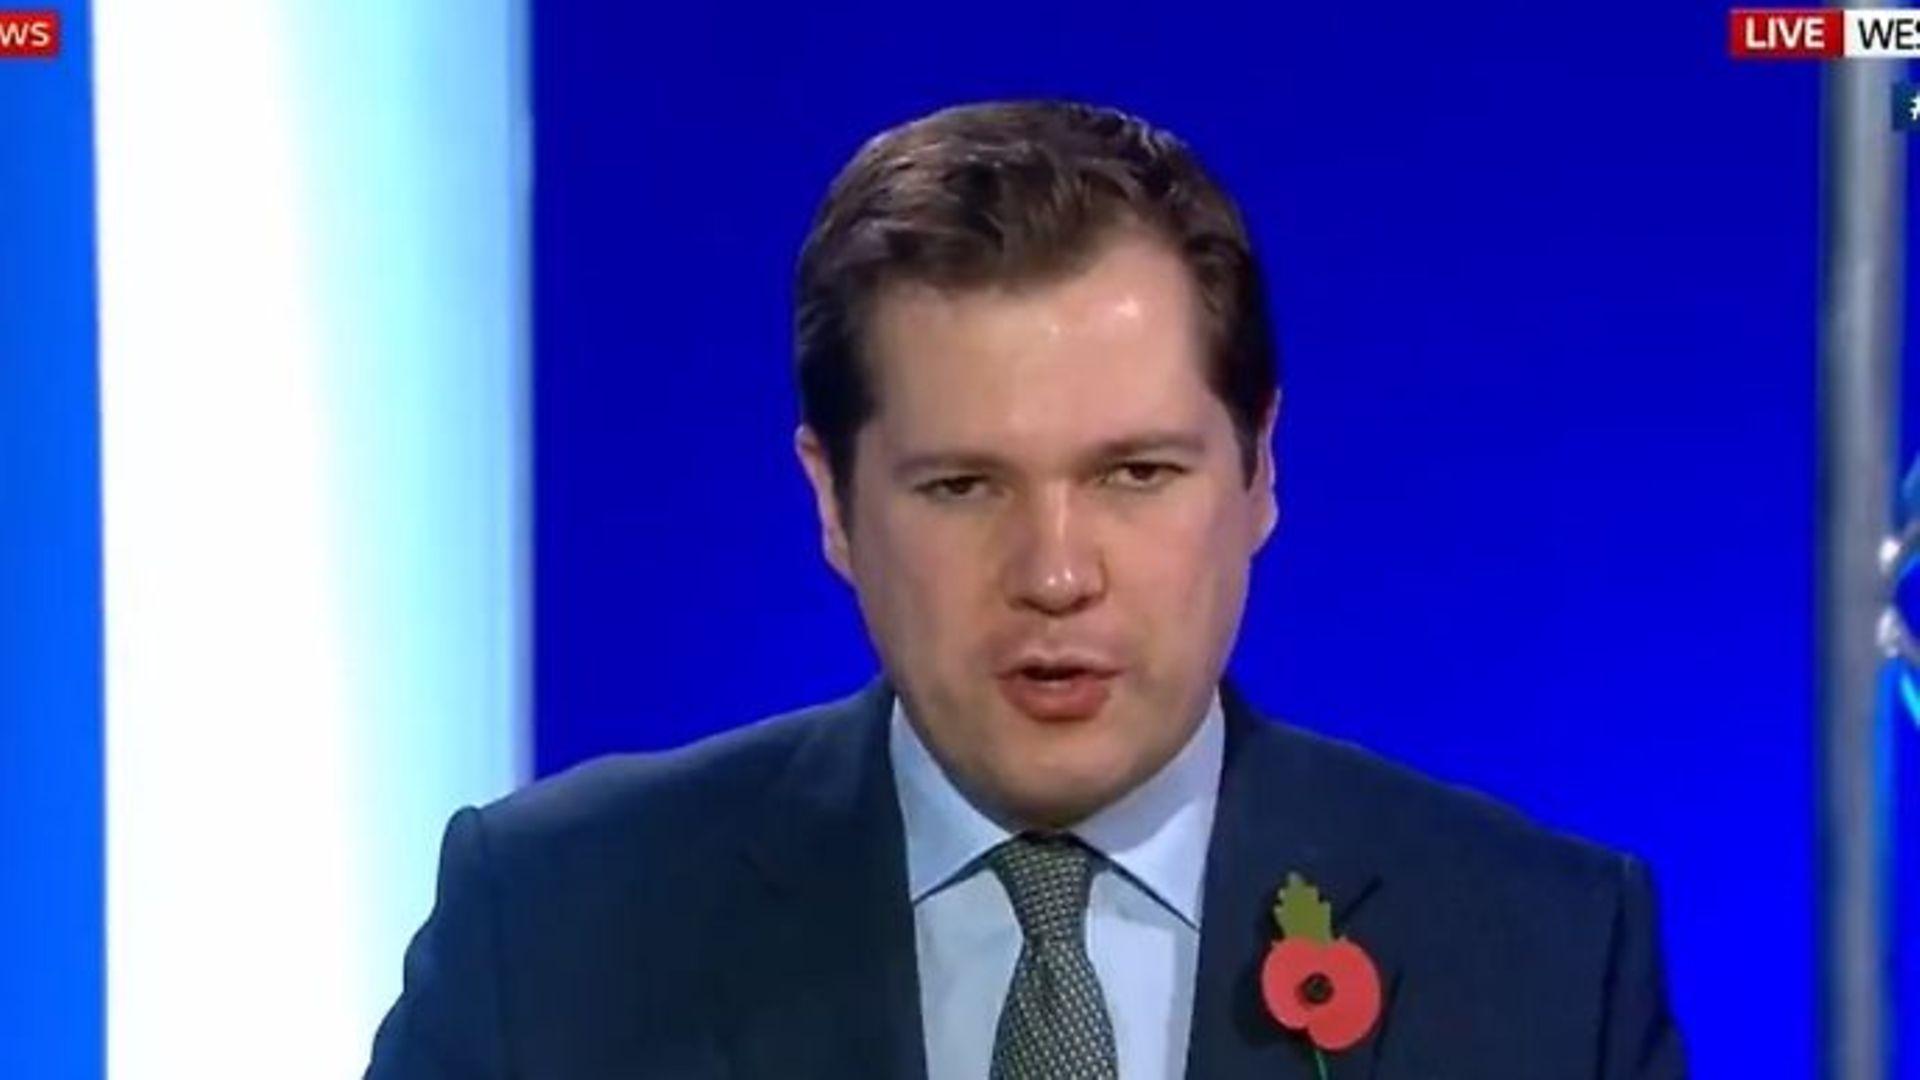 Housing and communities minister Robert Jenrick on Sky News - Credit: Twitter